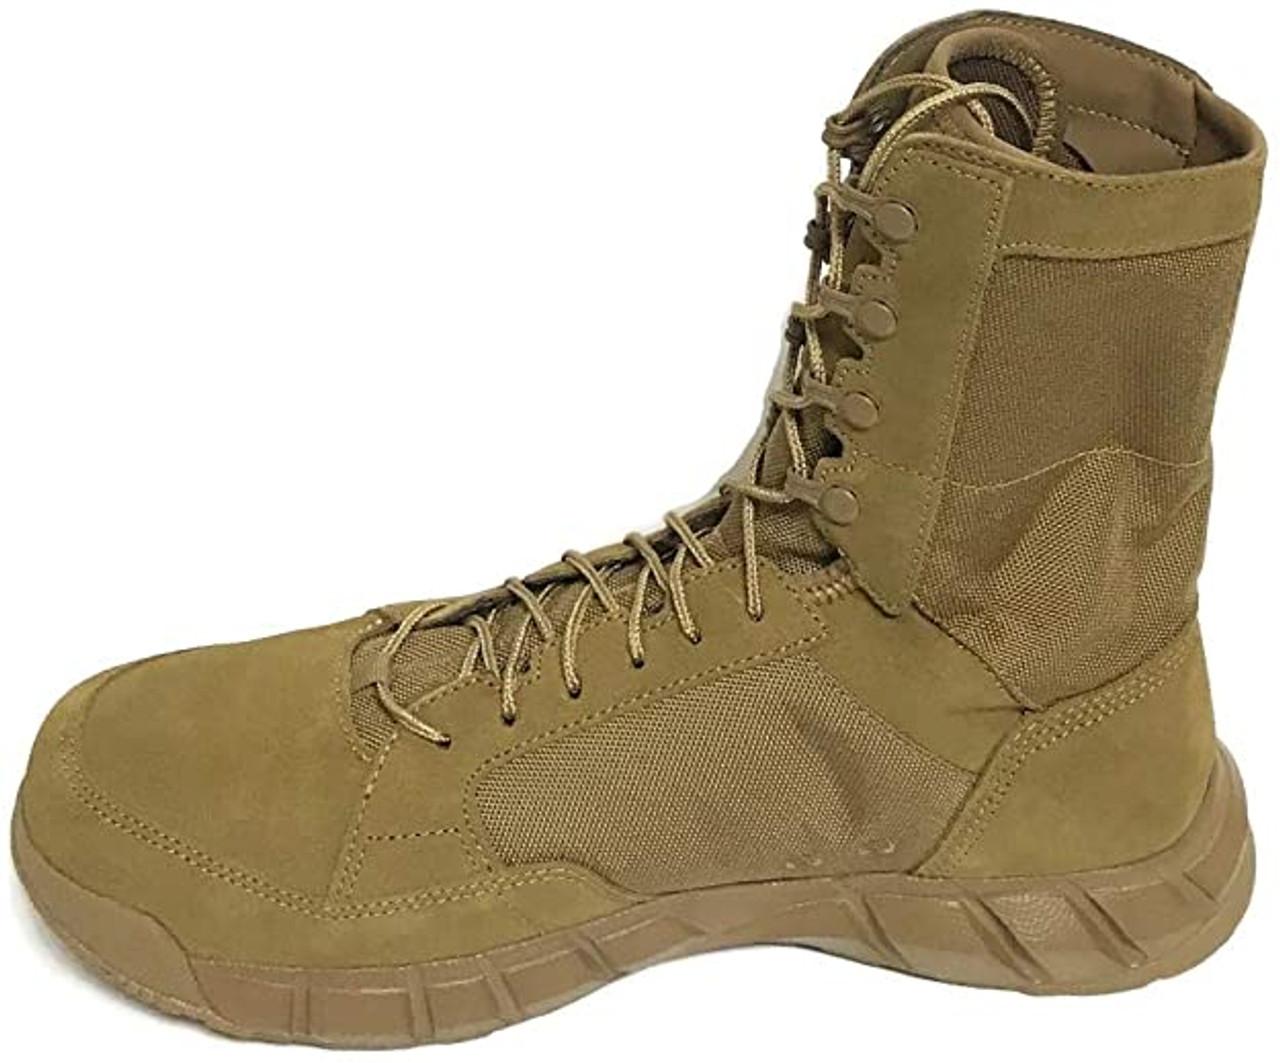 Oakley Men's Light Assault 2 Boots Coyote Size 10